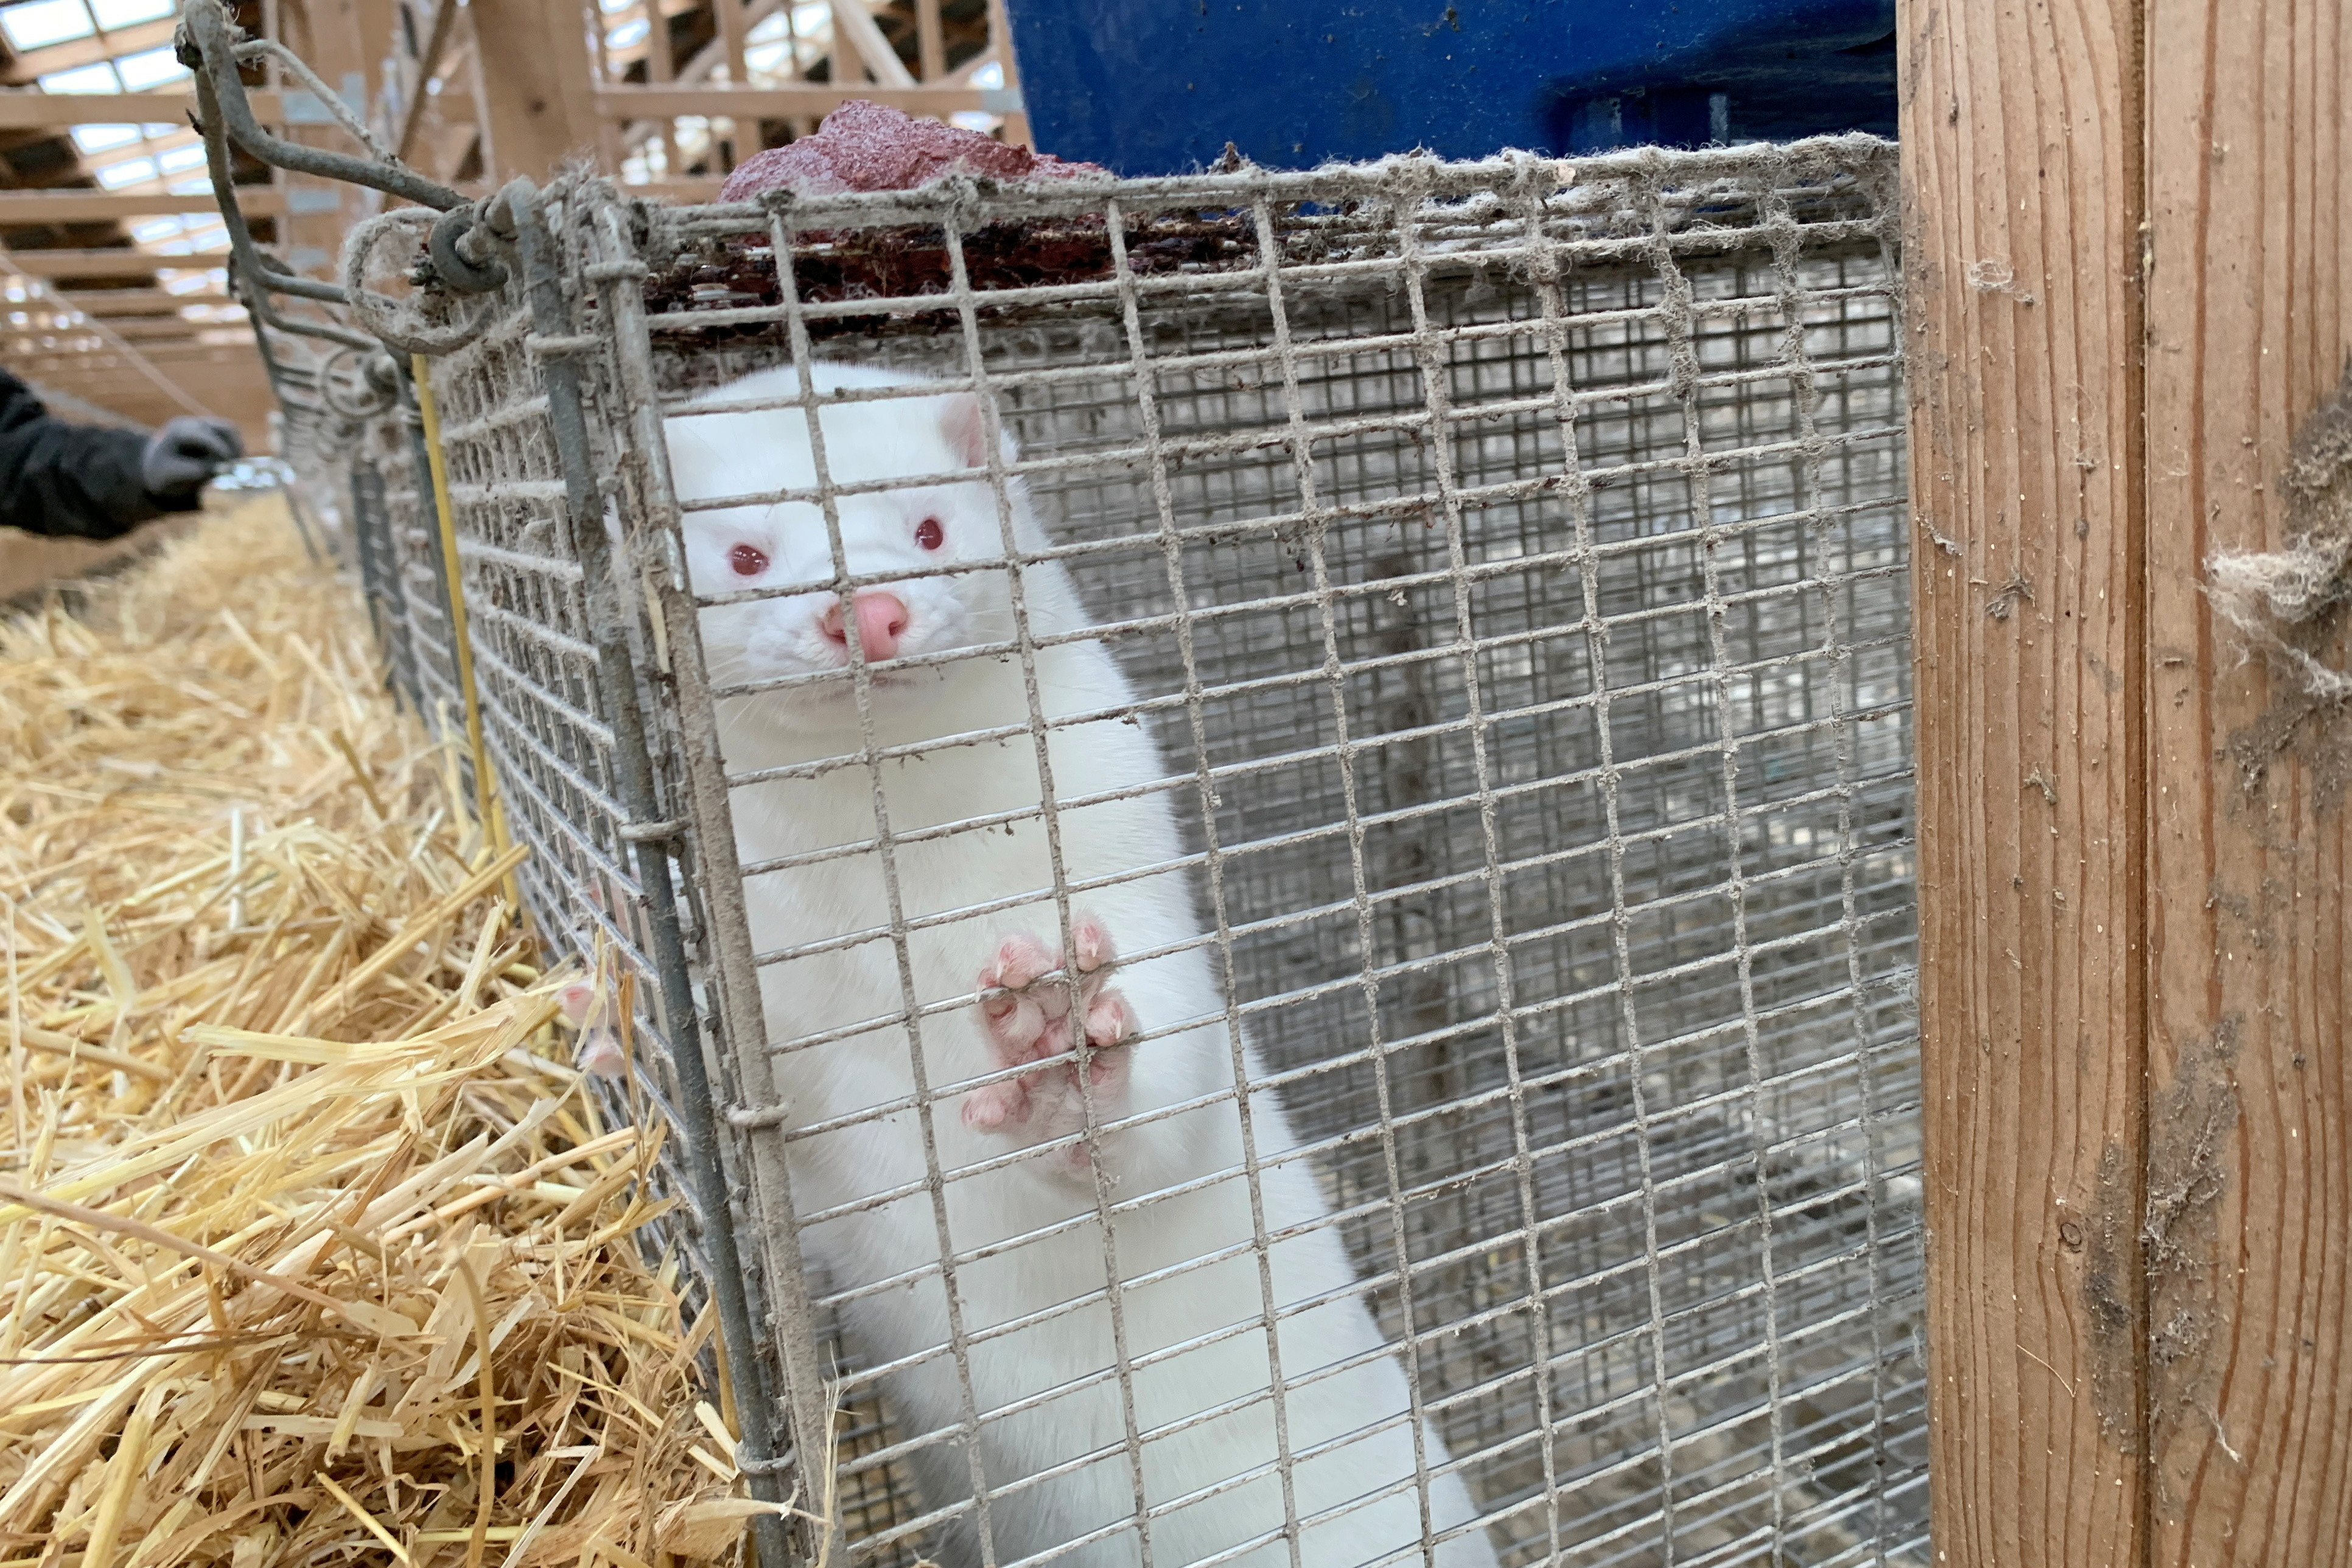 A mink is seen at Hans Henrik Jeppesen's farm near Soroe, after government's decision to cull his entire herd due to coronavirus disease (COVID-19), Denmark November 5, 2020. REUTERS/Jacob Gronholt-Pedersen - RC23XJ9714ZJ